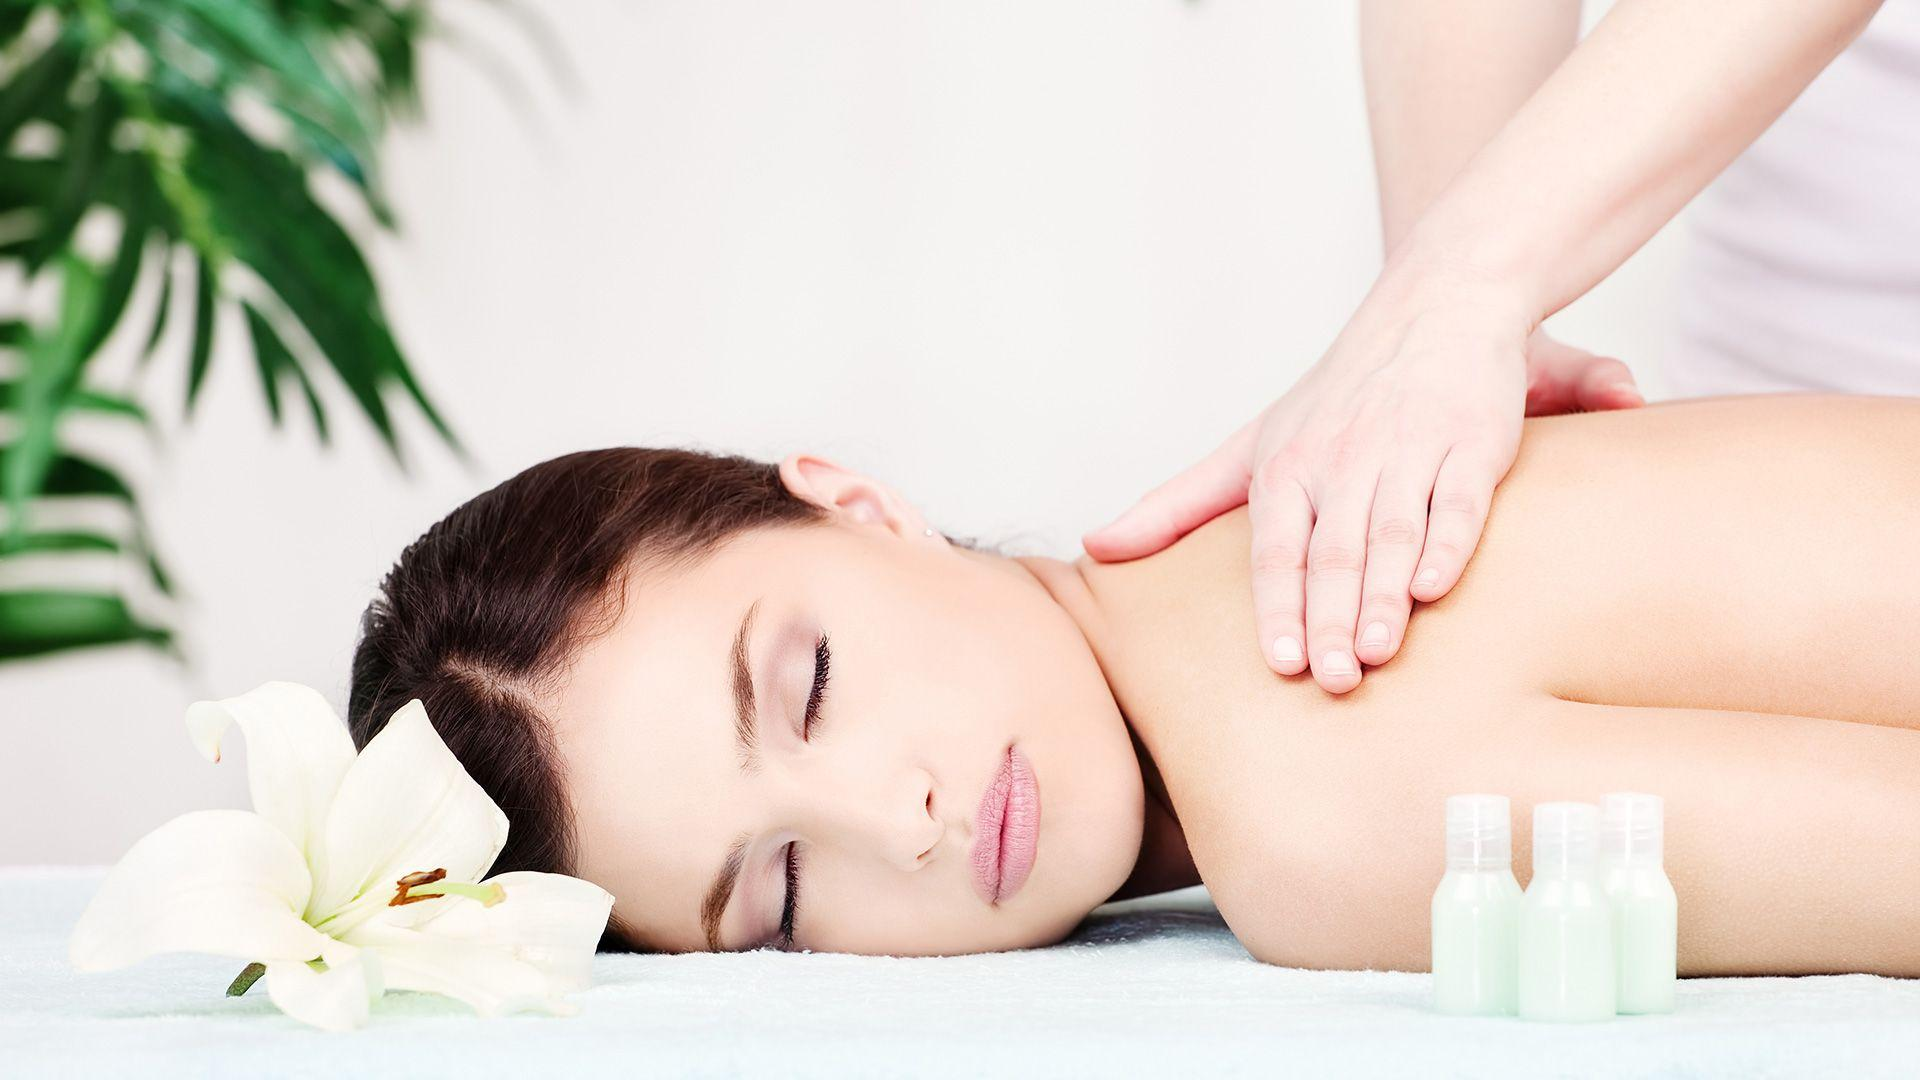 Massages Wallpapers - Wallpaper Cave